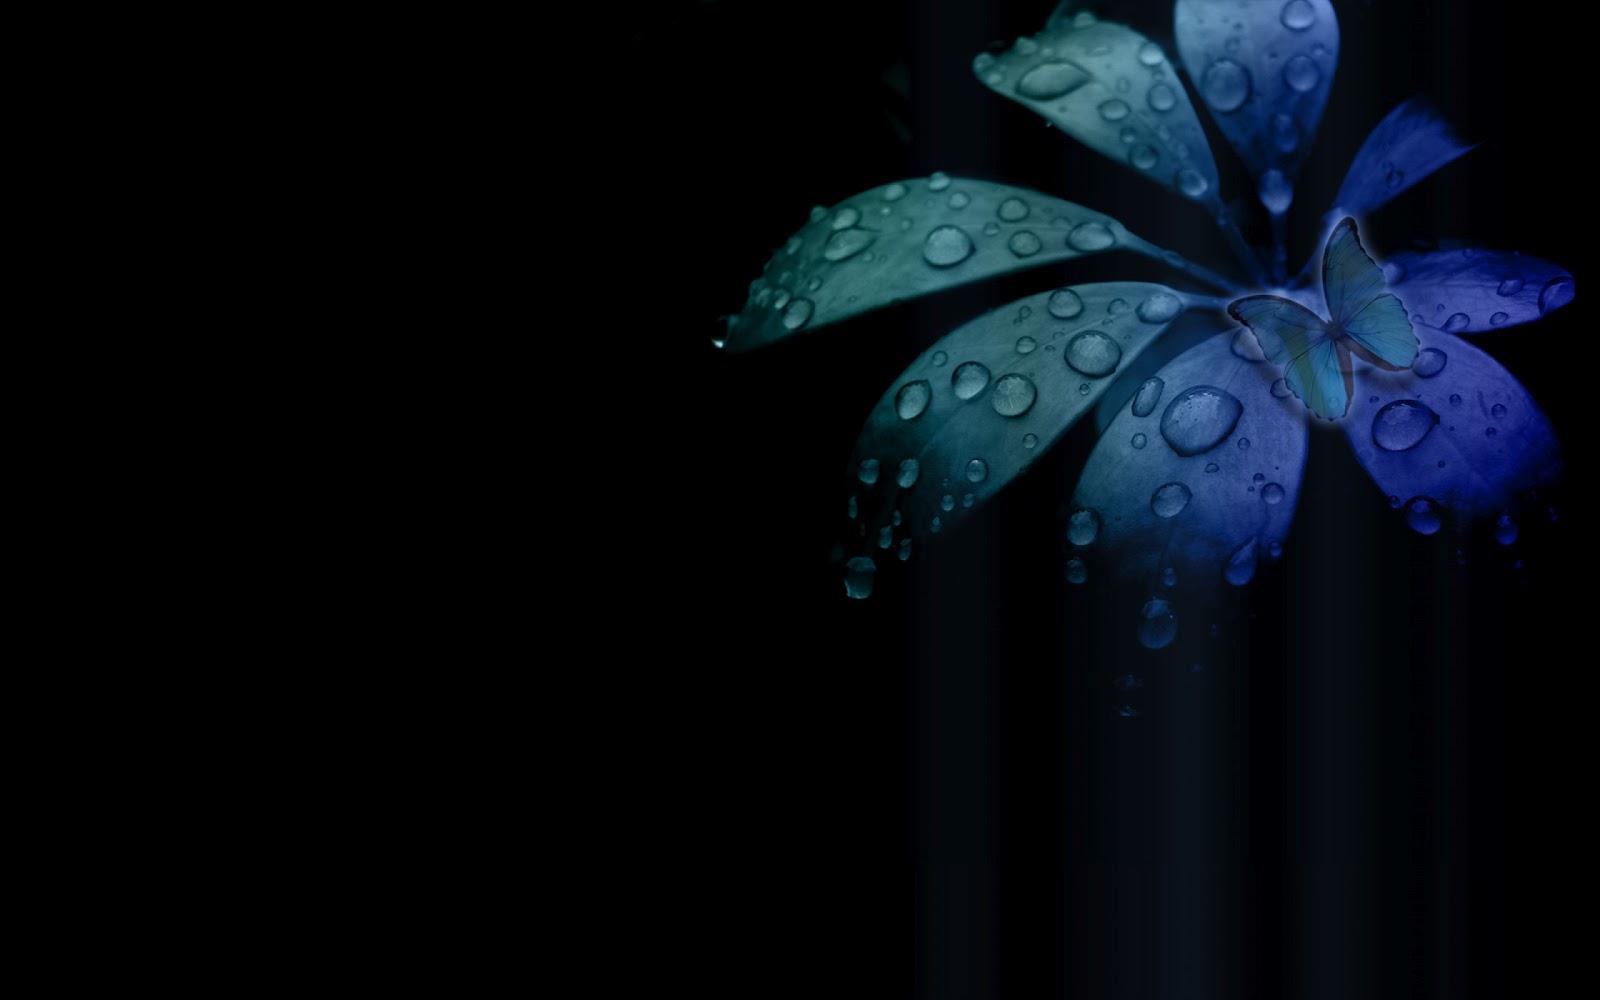 Wallpapers - HD Desktop Wallpapers Free Online: Flower ...